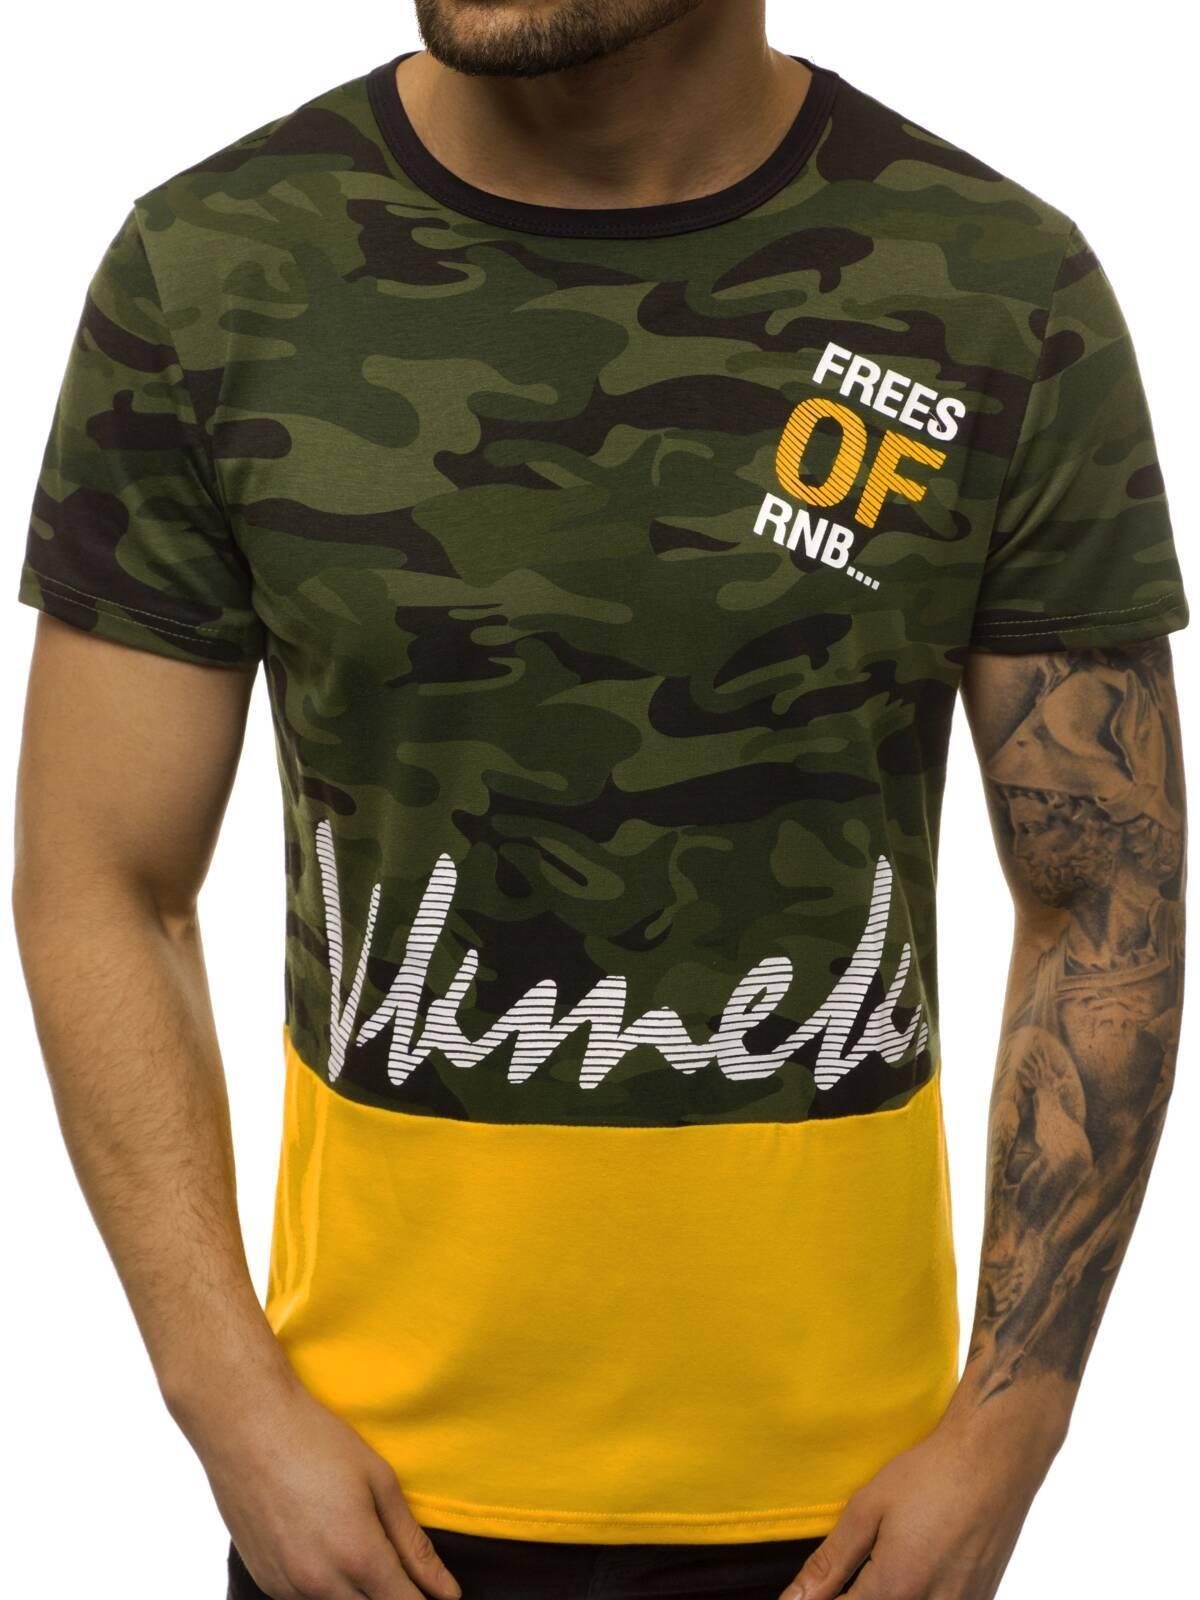 Indexbild 40 - T-Shirt Kurzarm Print Aufdruck Fitness Jogging Sport Shirt Herren OZONEE 12511